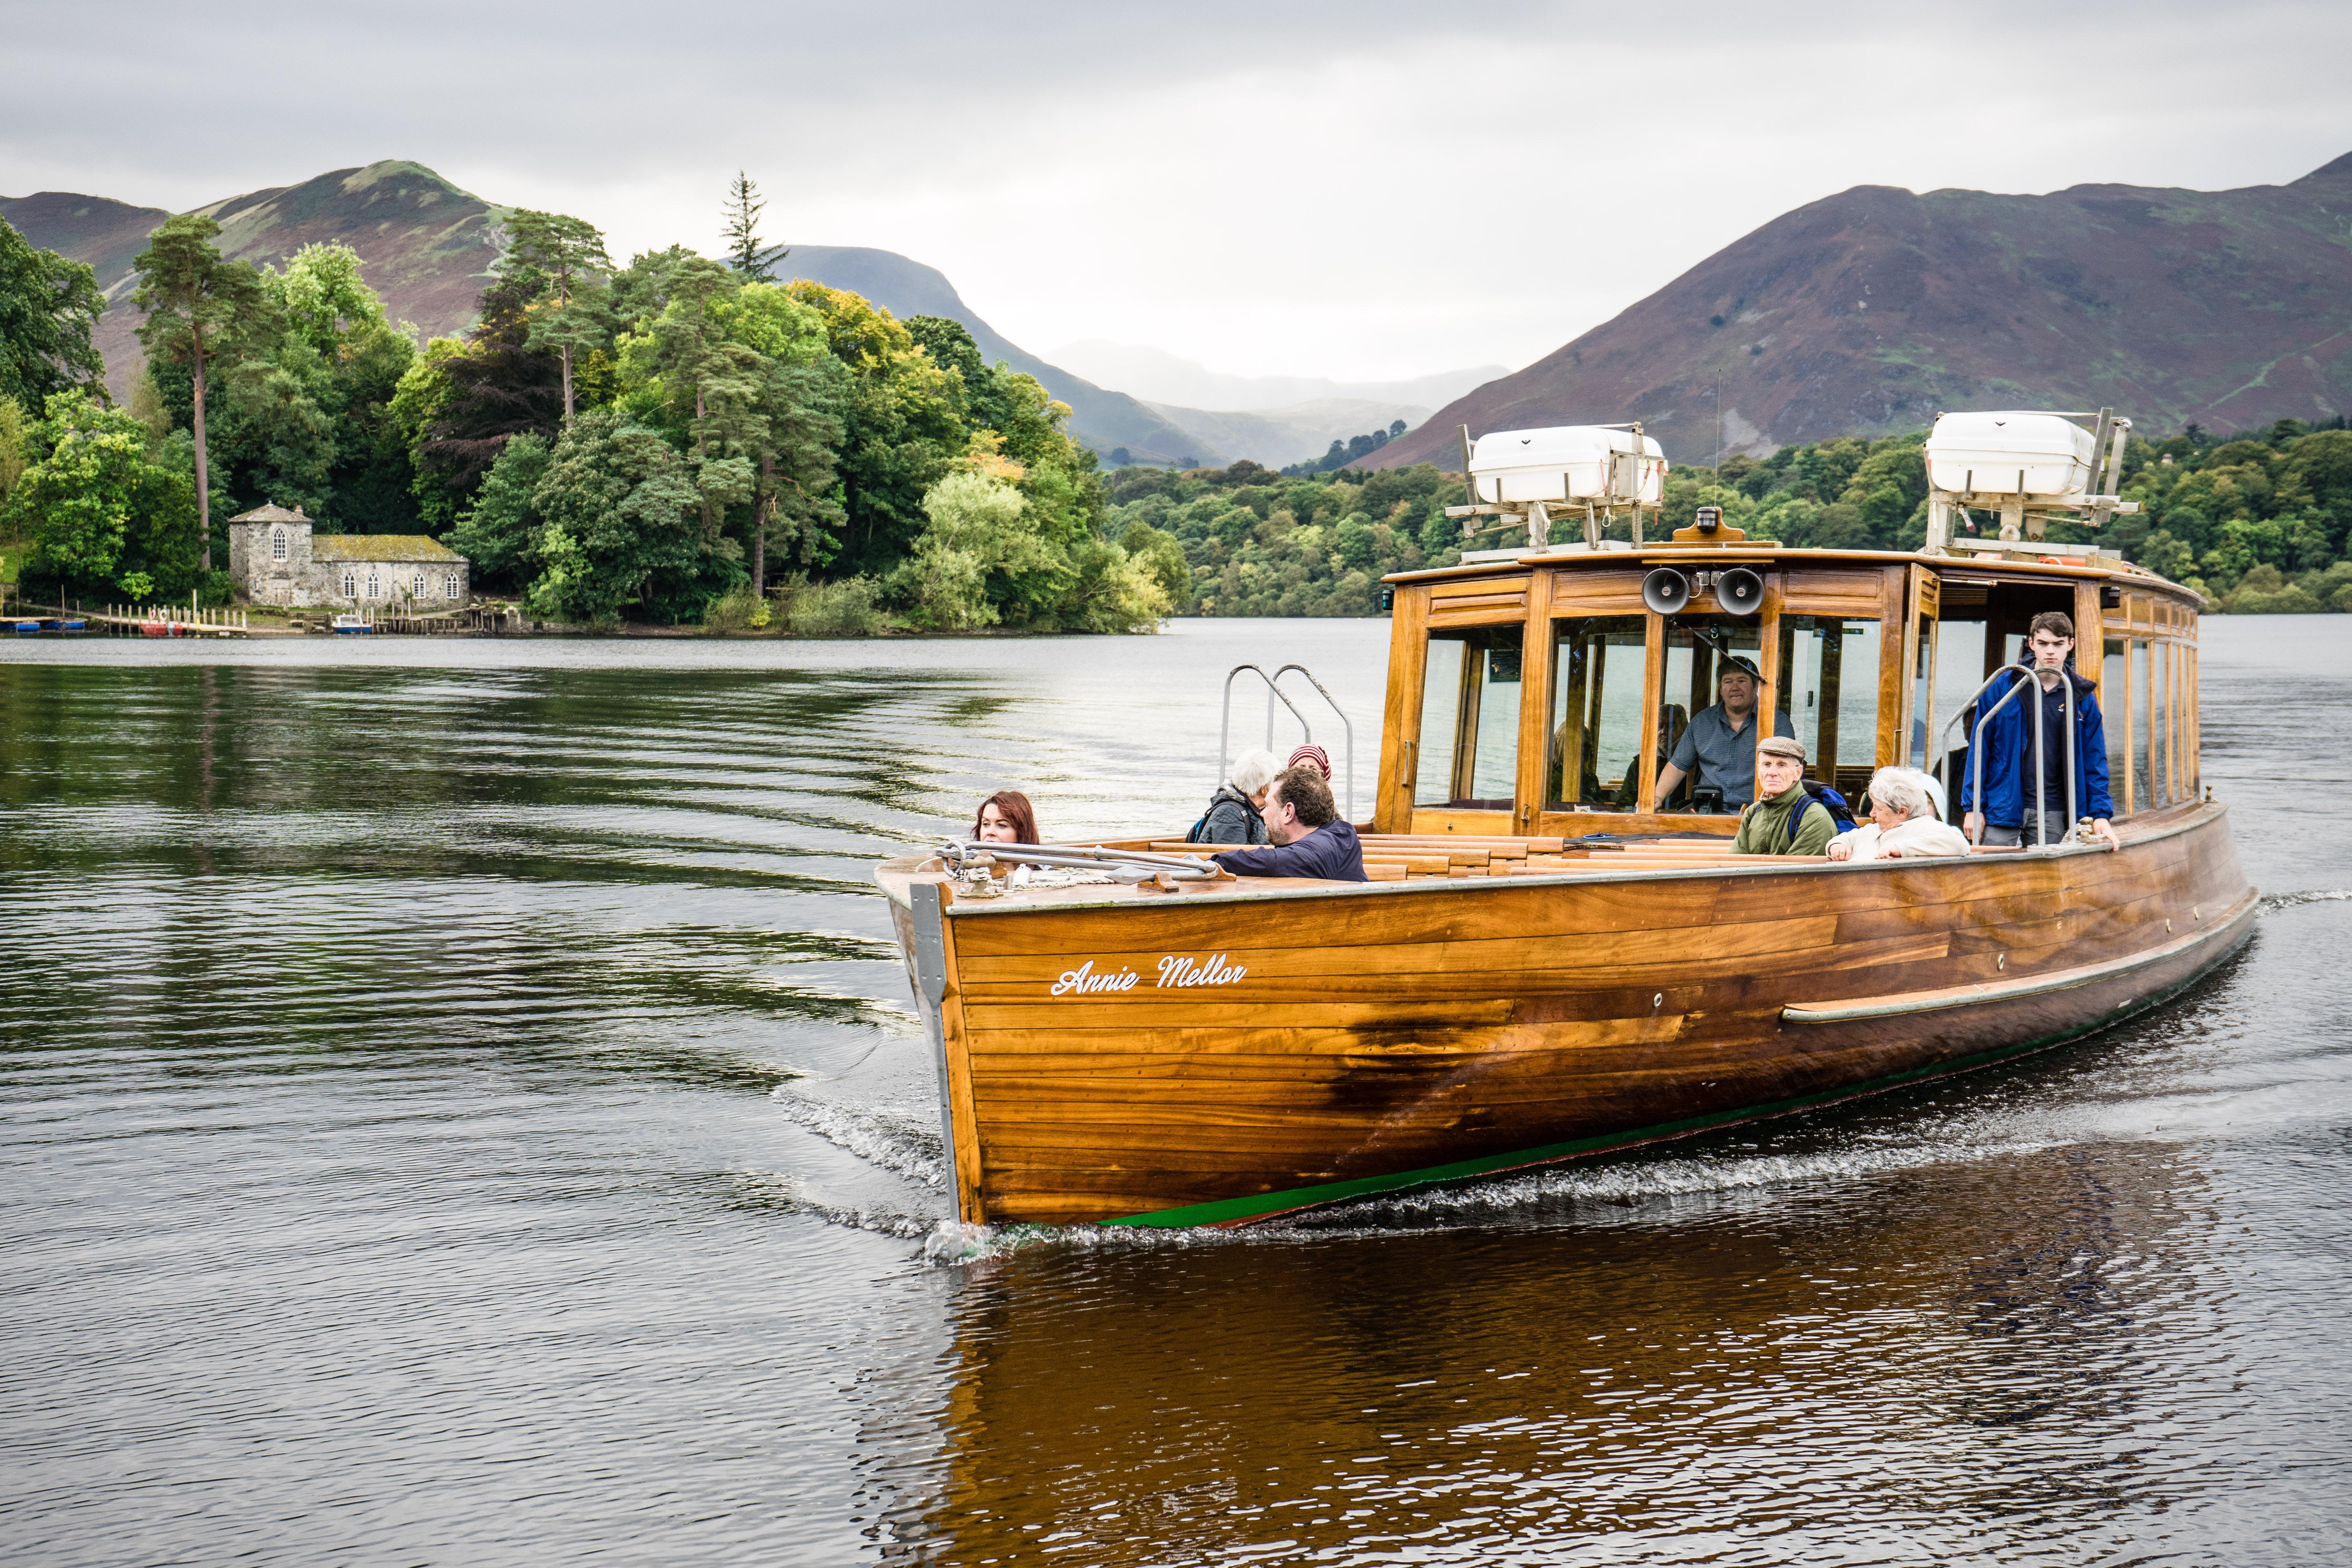 Boat near Derwent Isle - John Hodgson